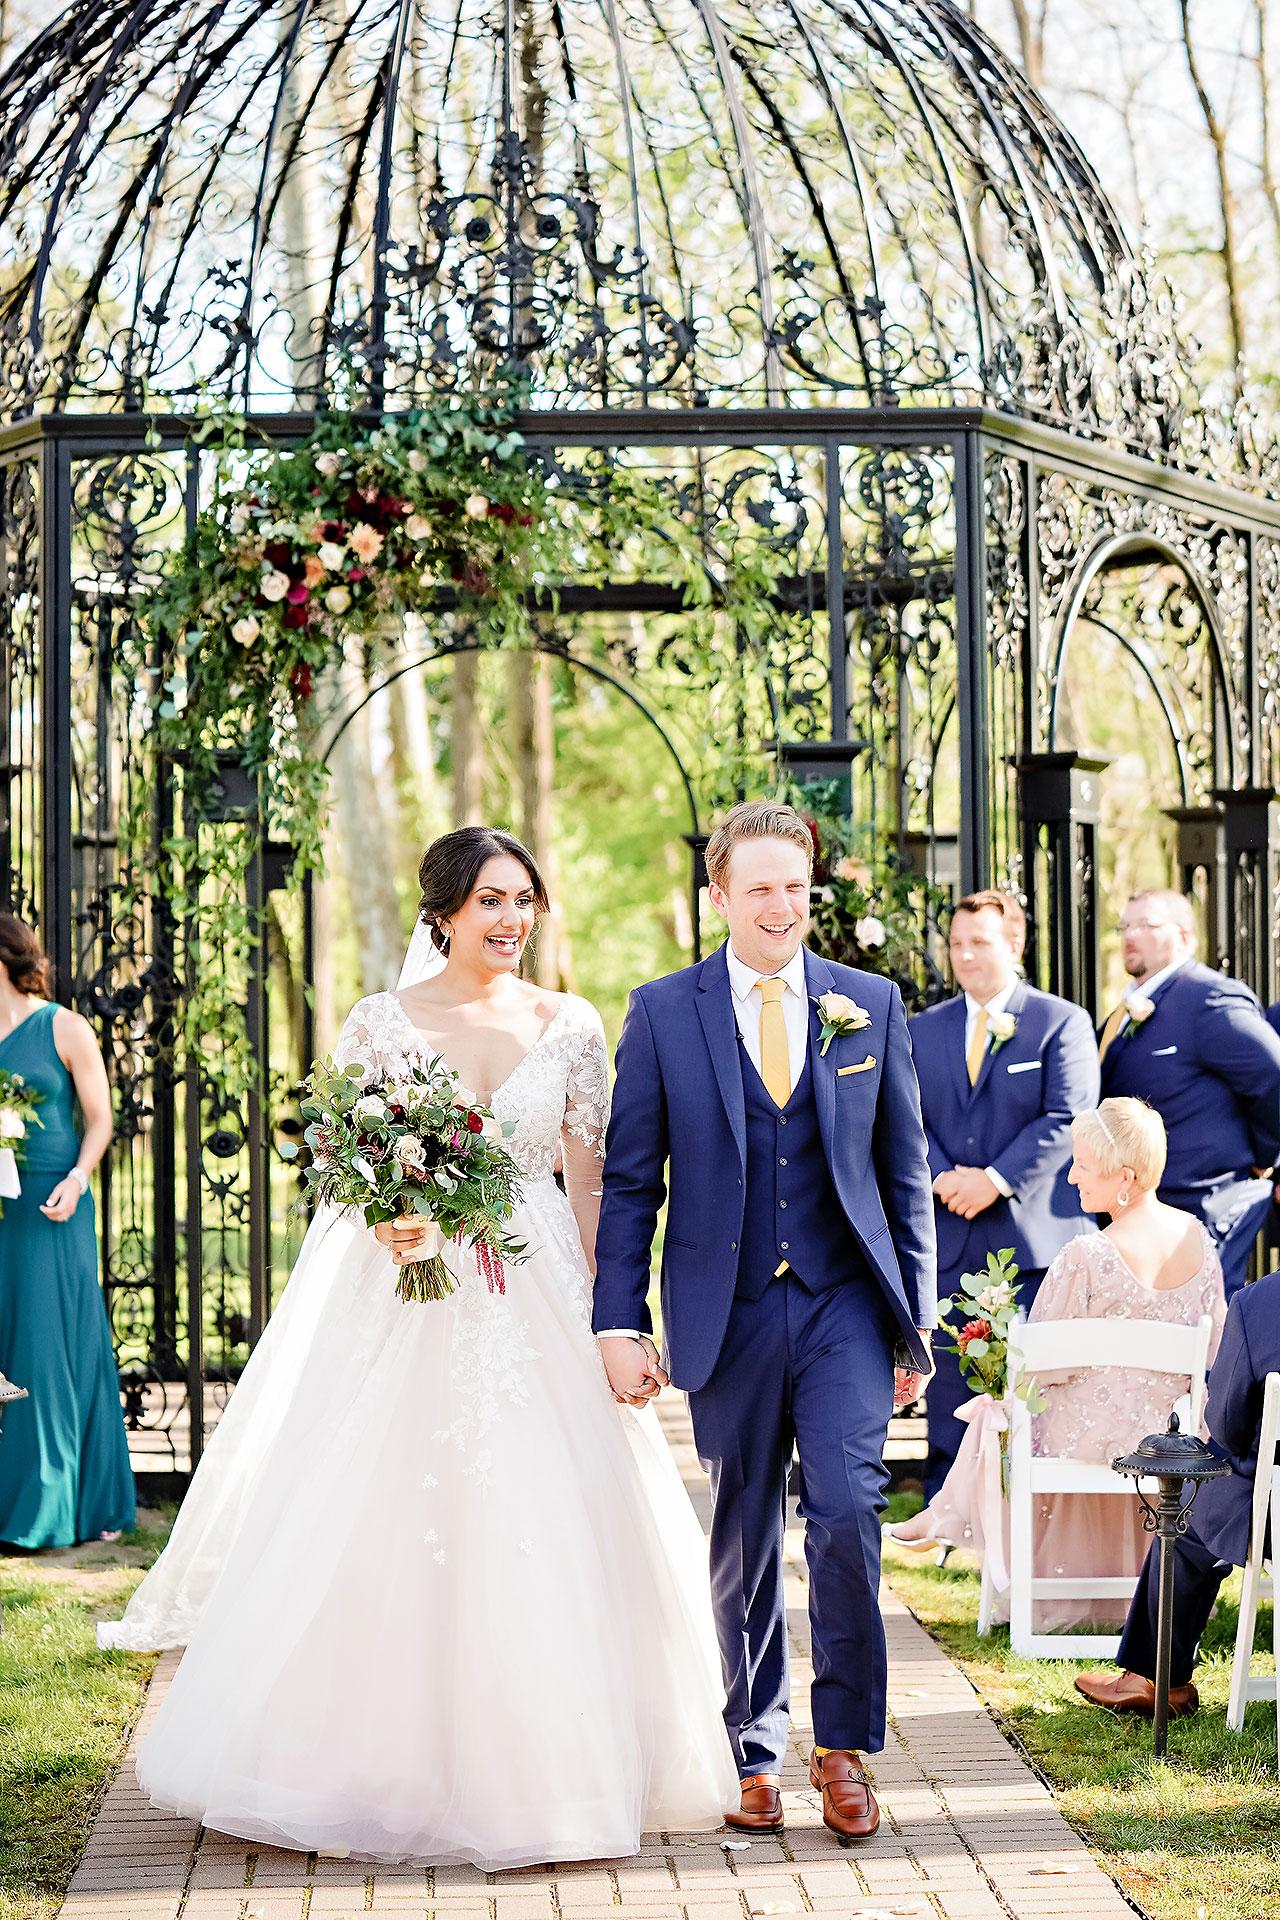 Nadia Parker Black Iris Estate Carmel Indiana Wedding May 2021 187